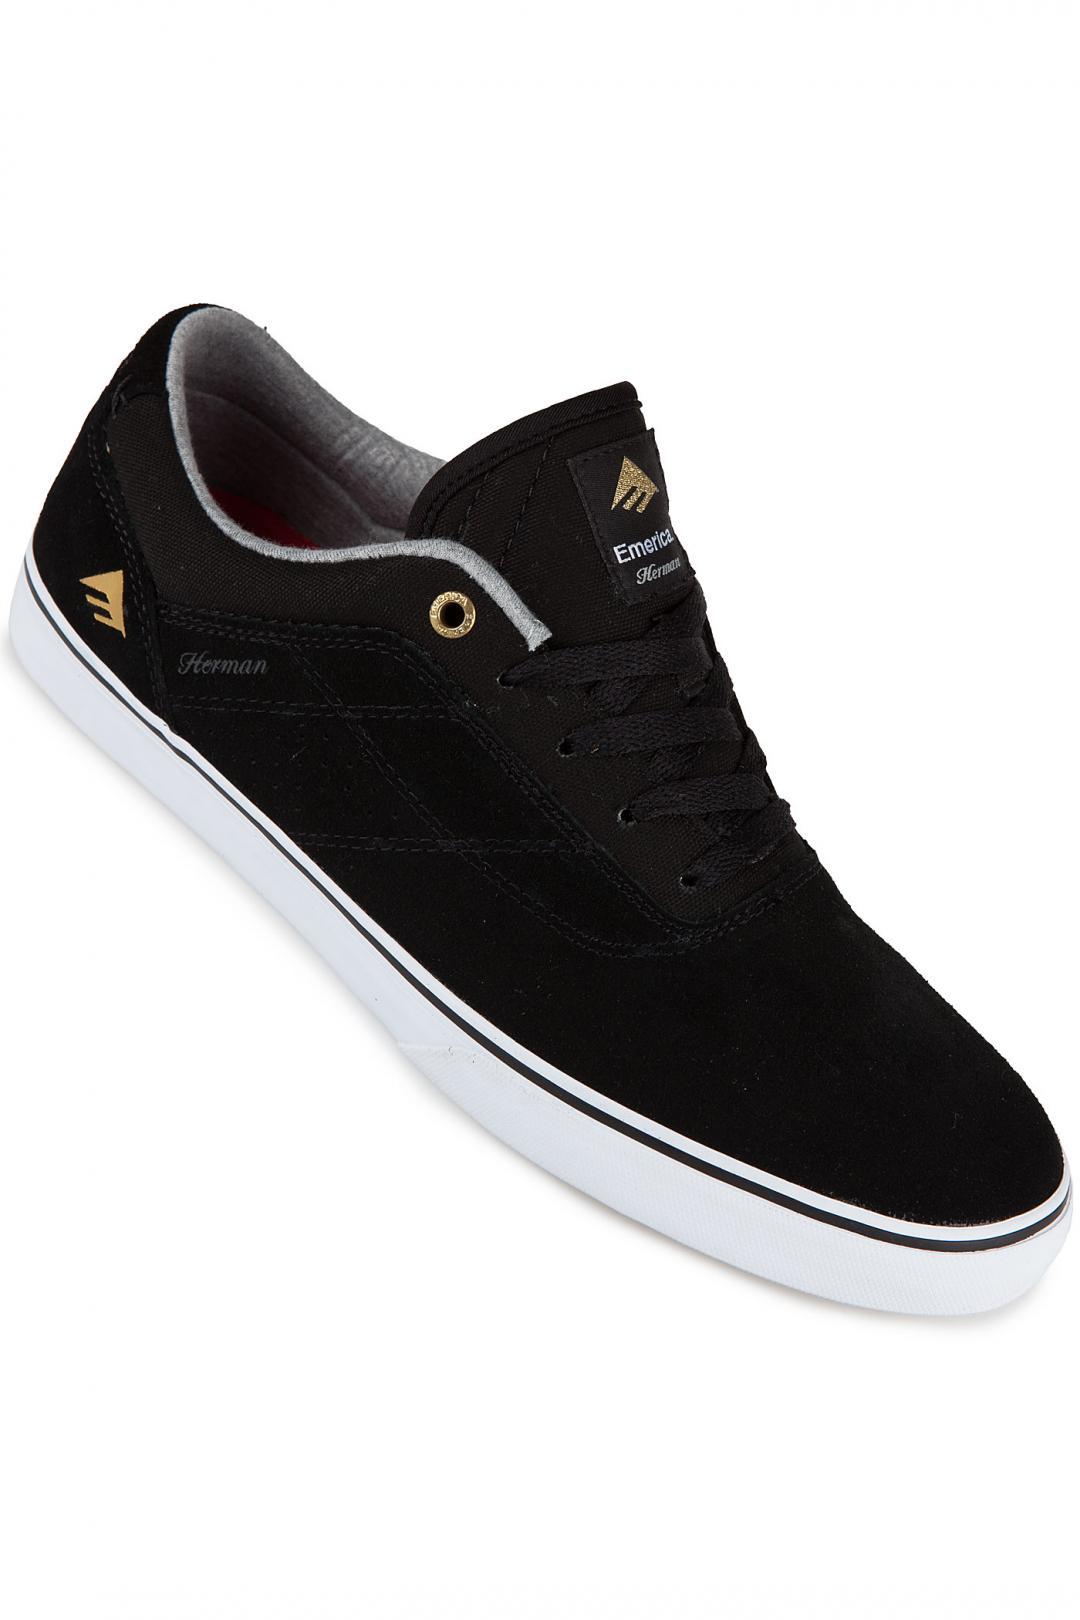 Uomo Emerica The Herman G6 Vulc black white | Sneakers low top